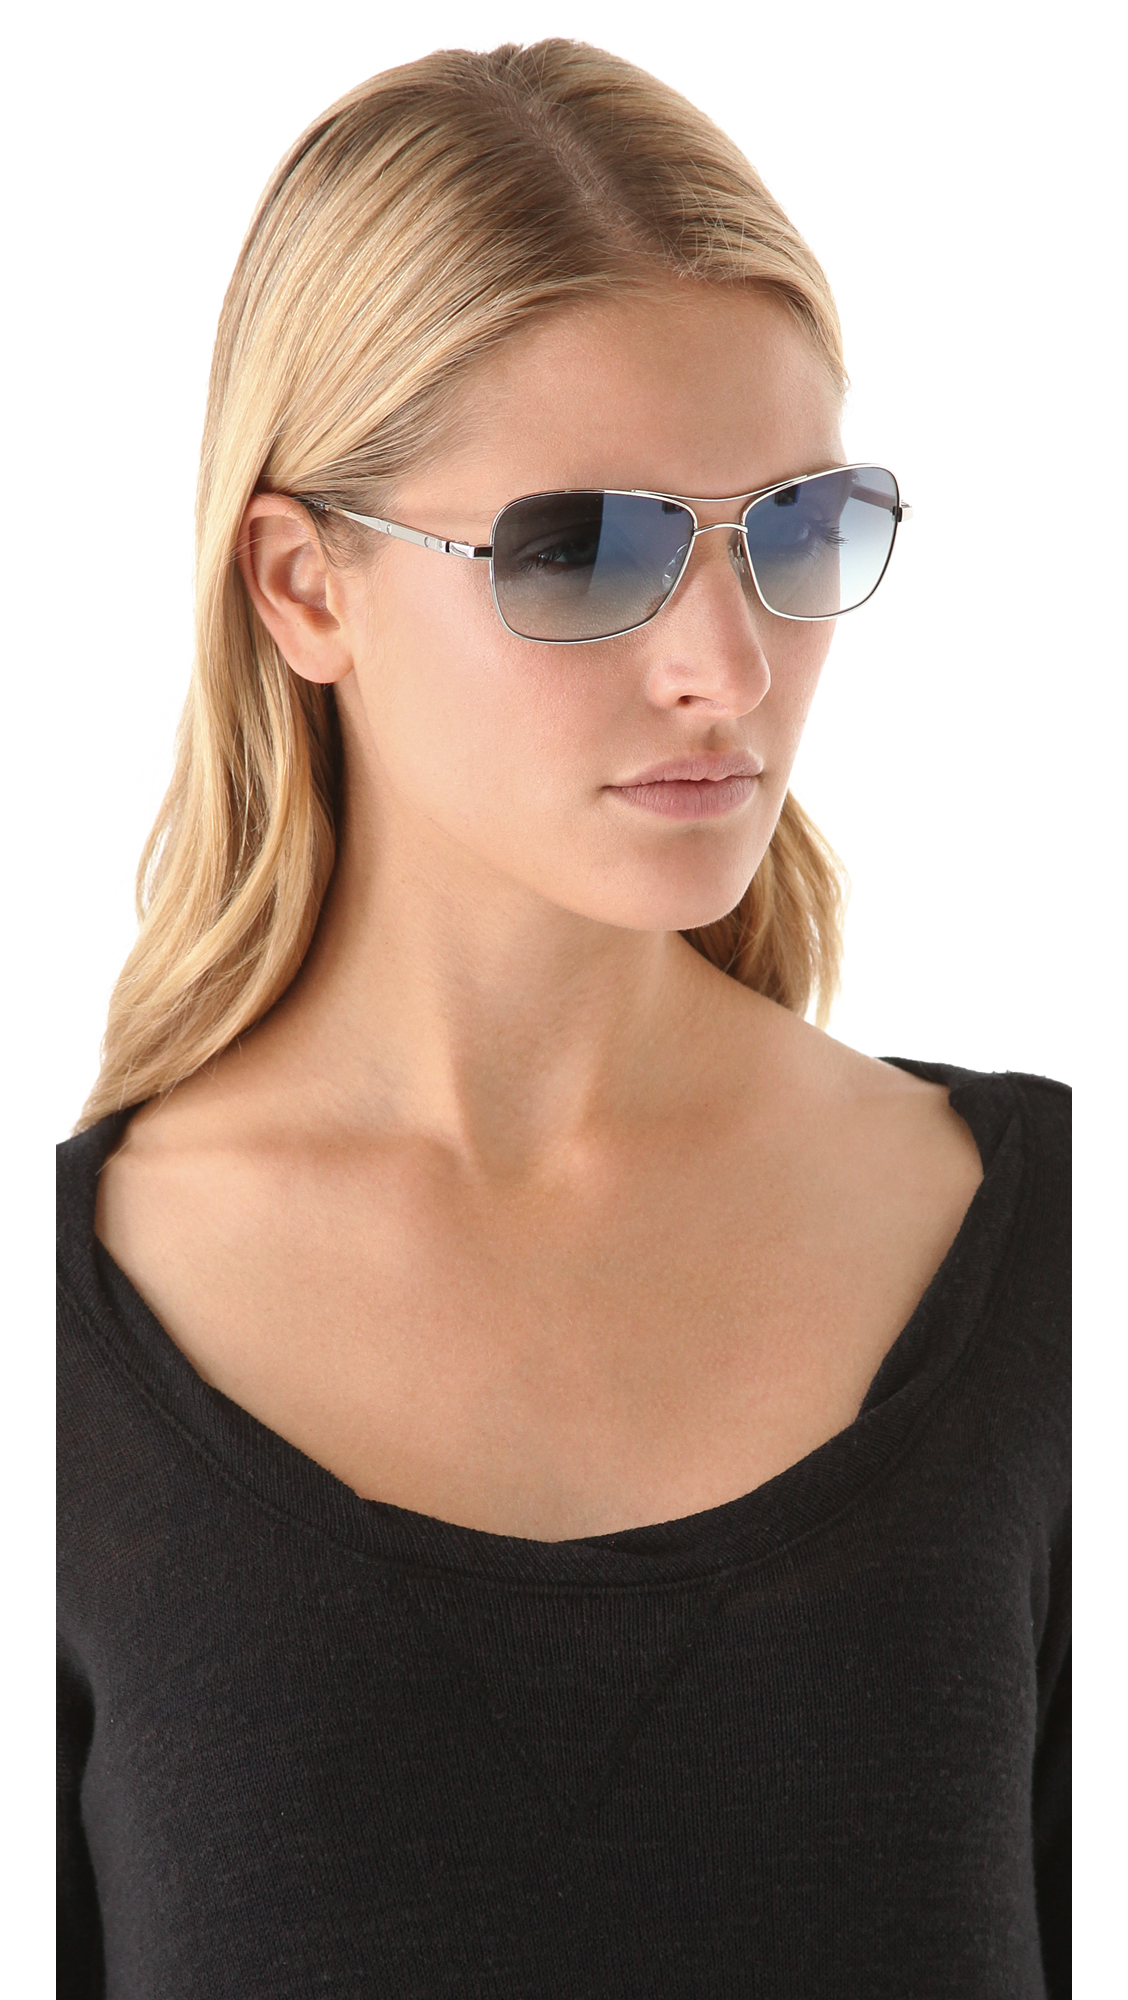 Eyewear Peoples Photochromatic SunglassesShopbop Sanford Oliver QCWdxerBo